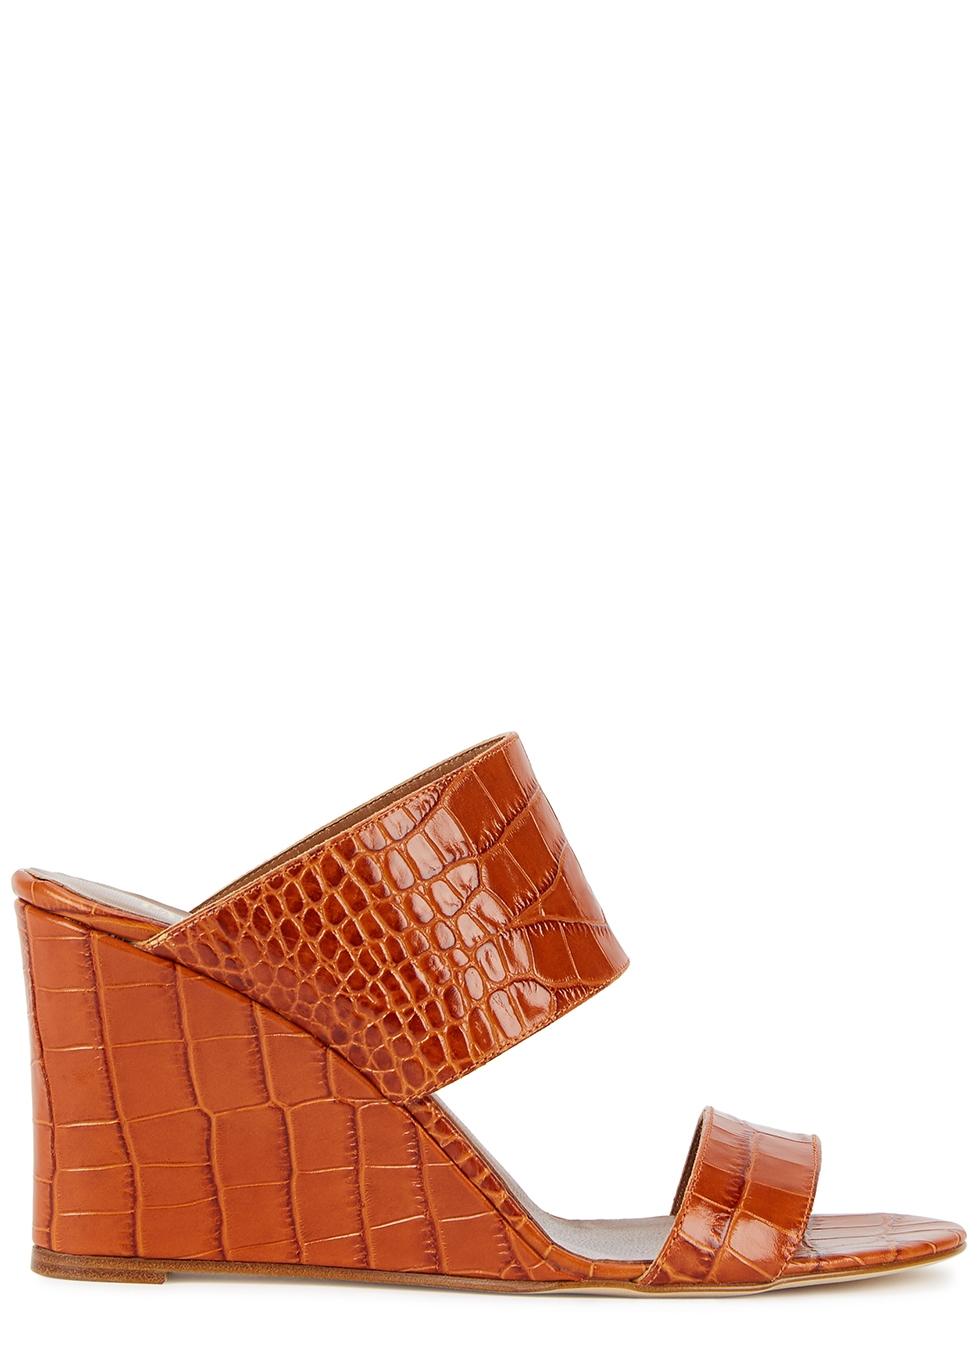 80mm crocodile-effect leather wedge mules